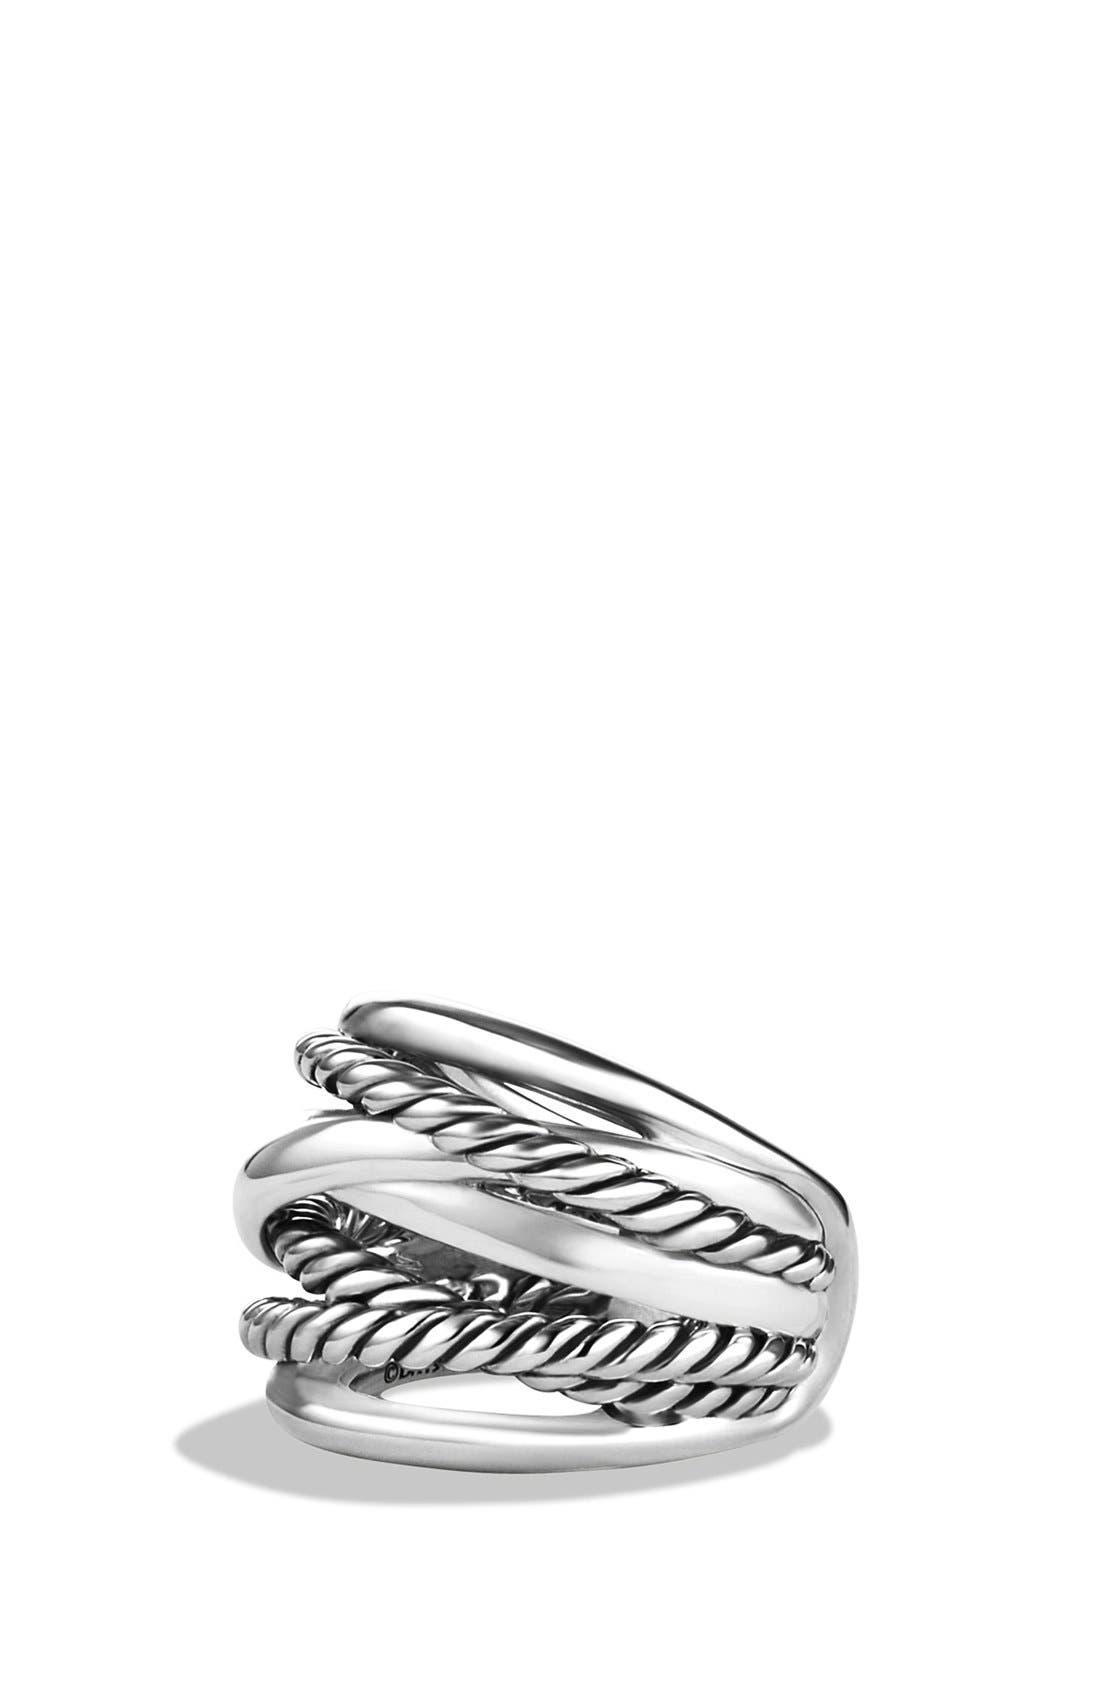 Main Image - David Yurman 'Crossover' Wide Ring